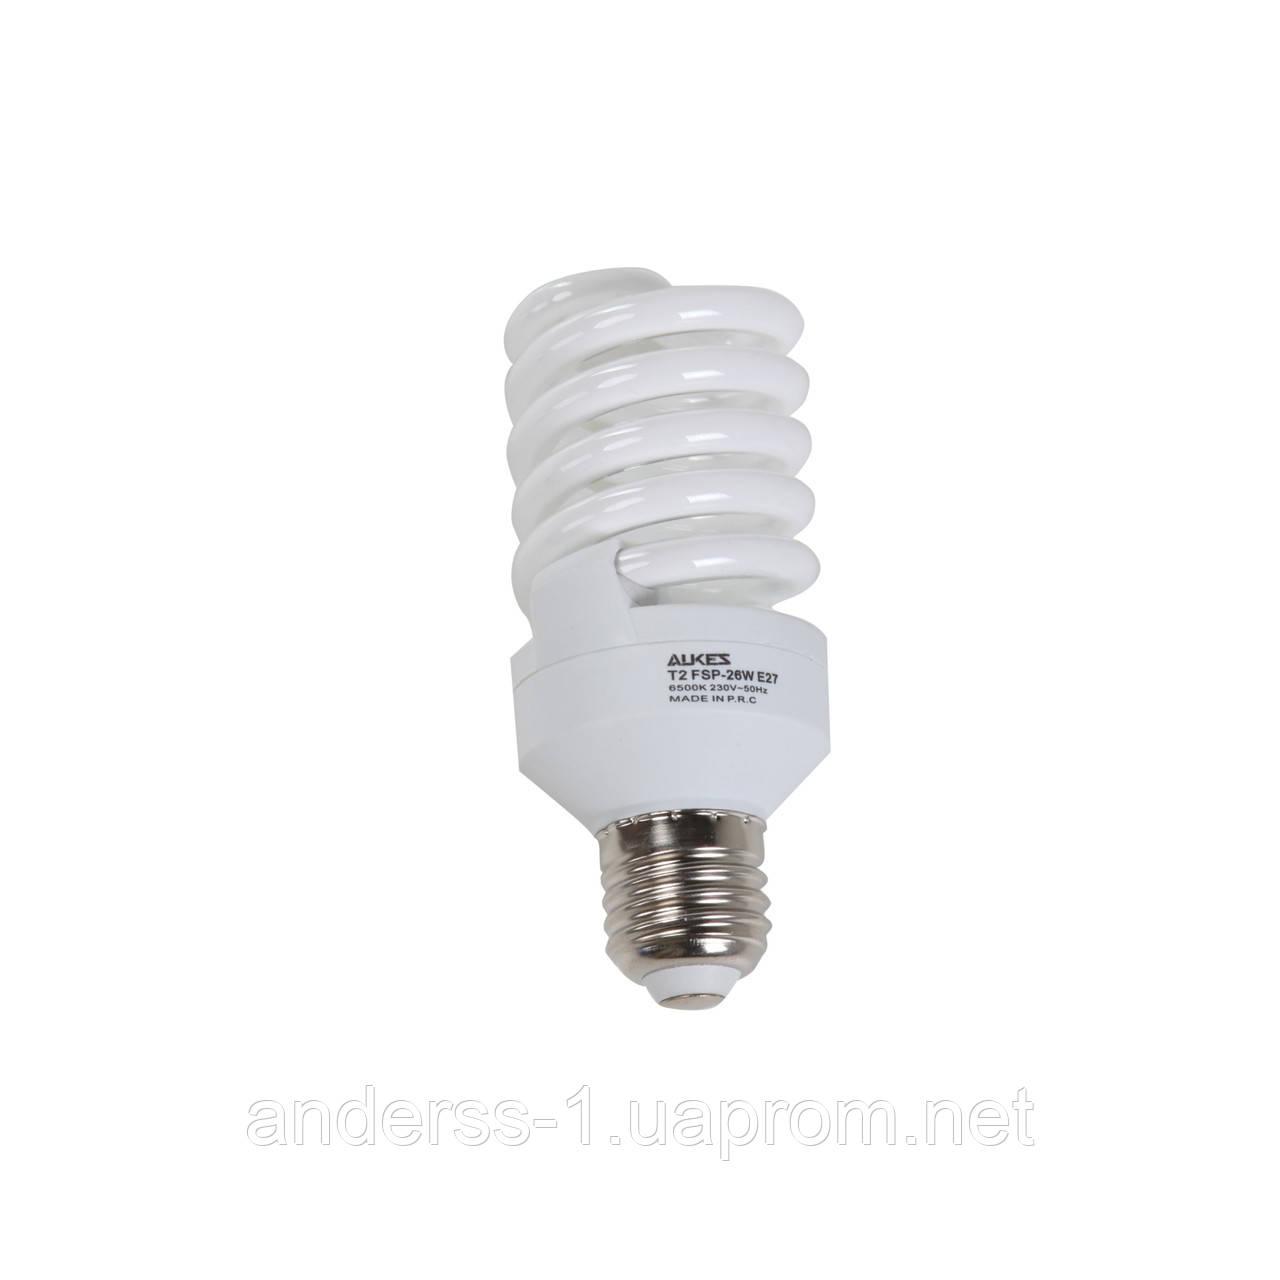 Энергосберегающая лампа Nur Led 20W